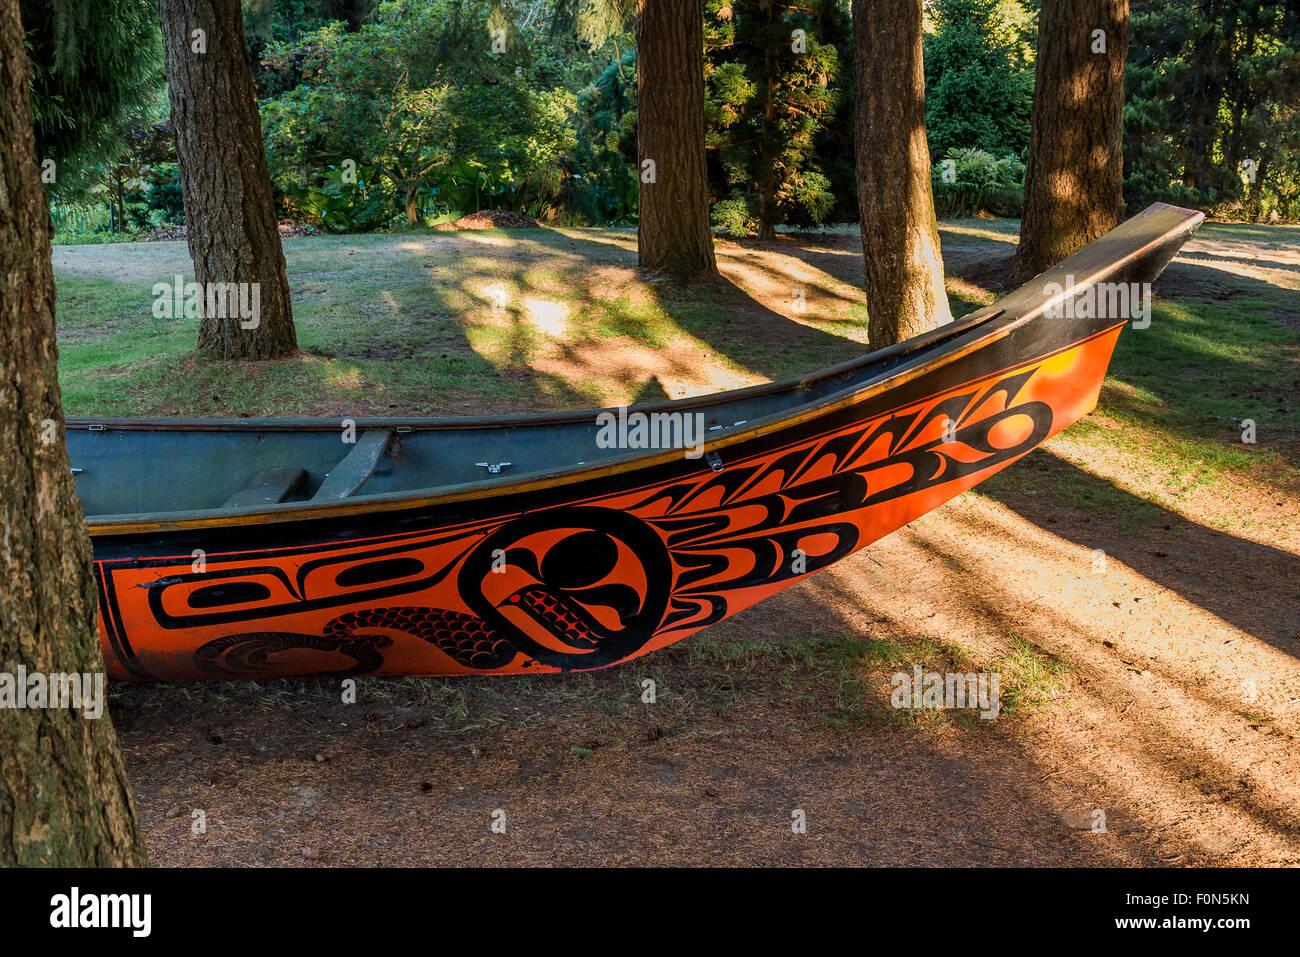 Fiberglass cast of Bill Reid's Black Eagle Canoe, Lootaas, VanDusen Gardens, Vancouver, British Columbia, Canada - Stock Image